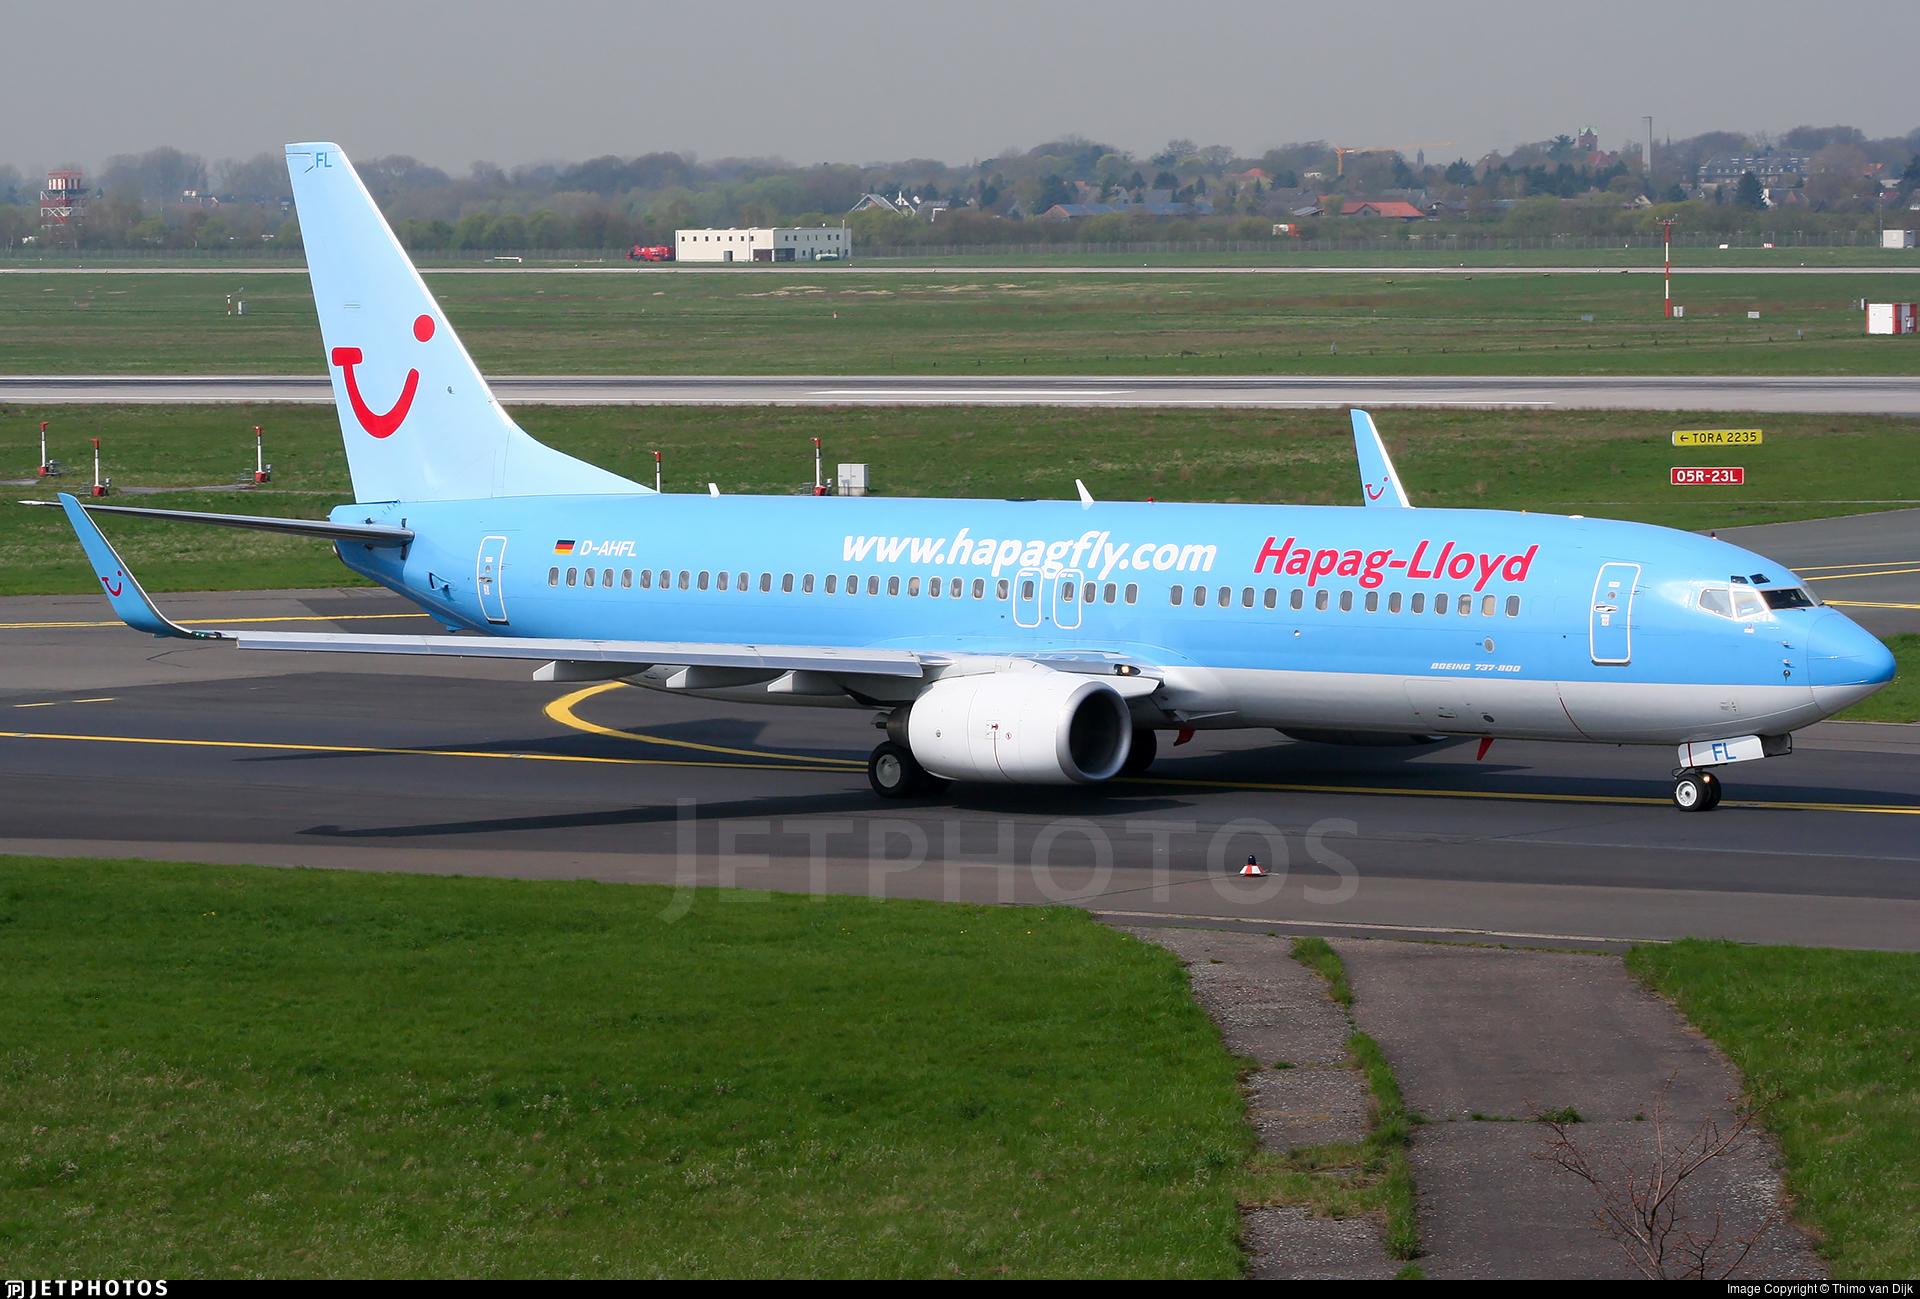 D-AHFL - Boeing 737-8K5 - Hapag-Lloyd